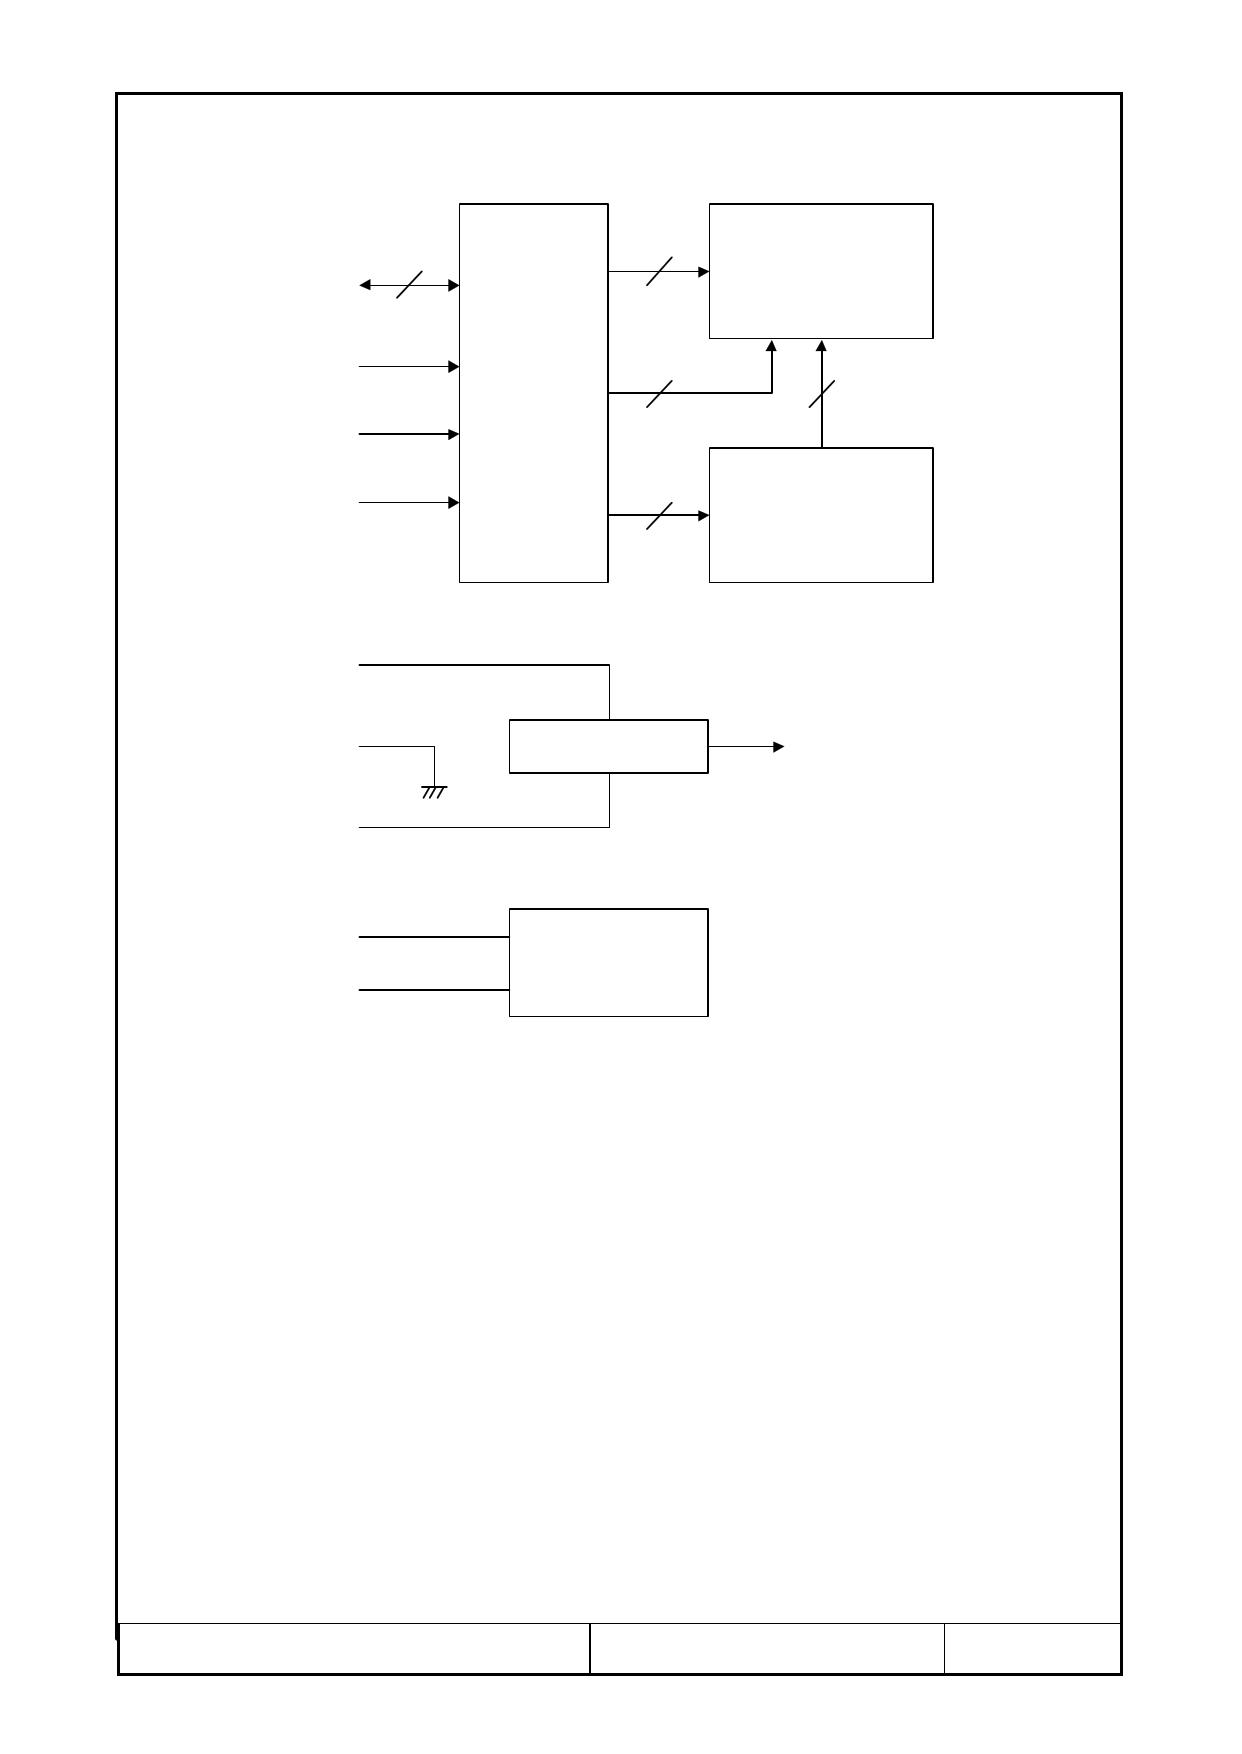 C-51505NFQJ-LB-AE arduino